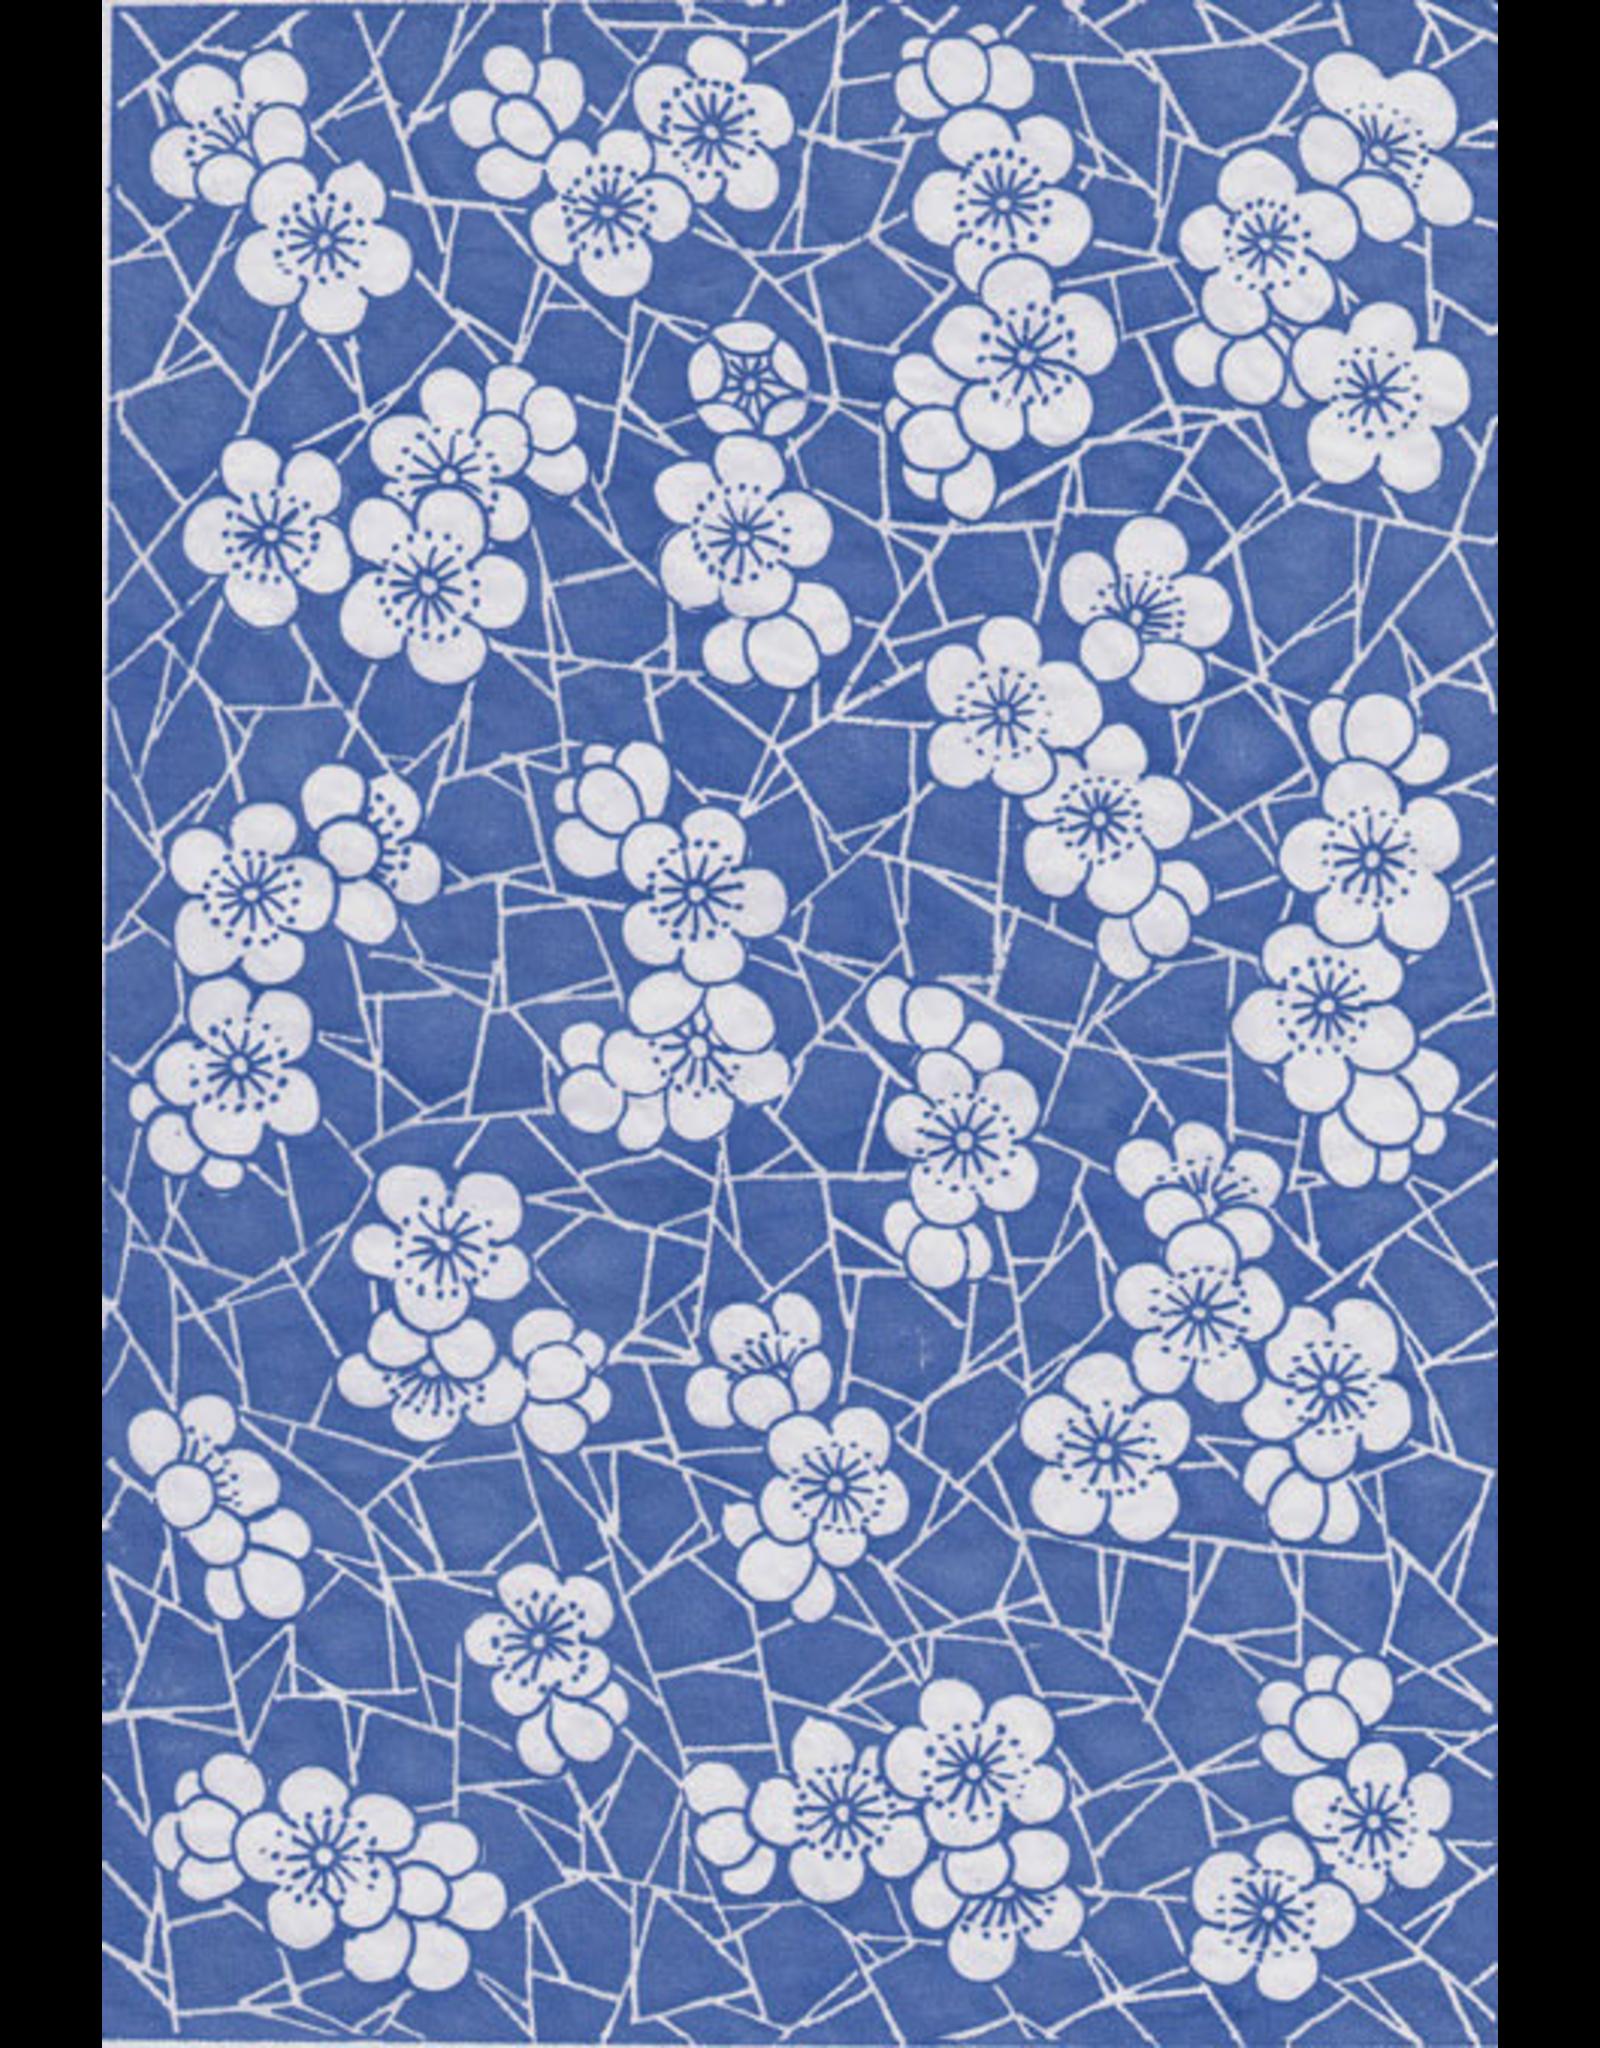 Sanbao Cherry flower decal 4 (underglaze decal - 16cm x 22cm)